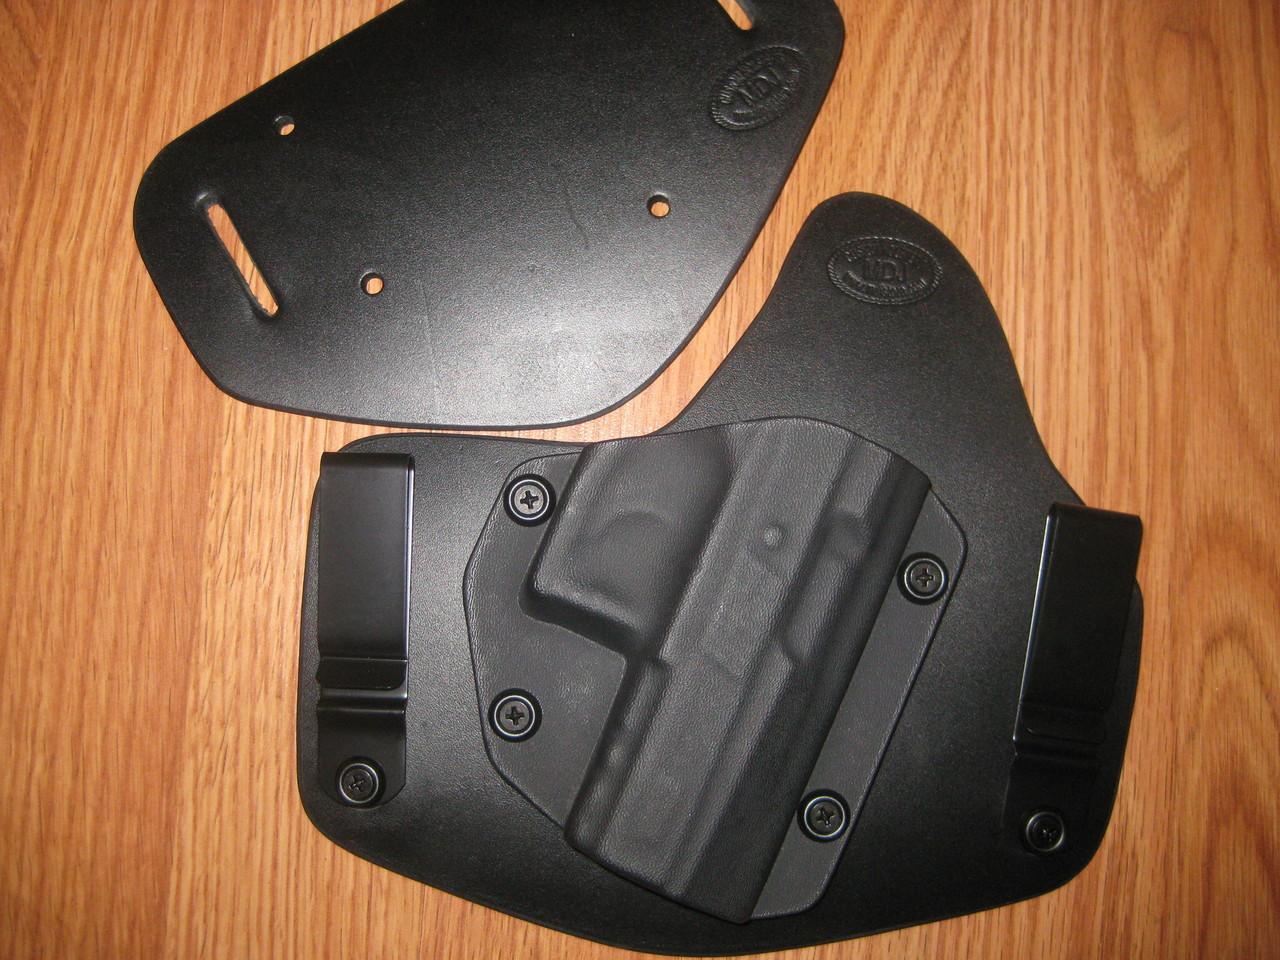 KIMBER IWB/OWB standard hybrid leather\Kydex Holster (Adjustable retention)